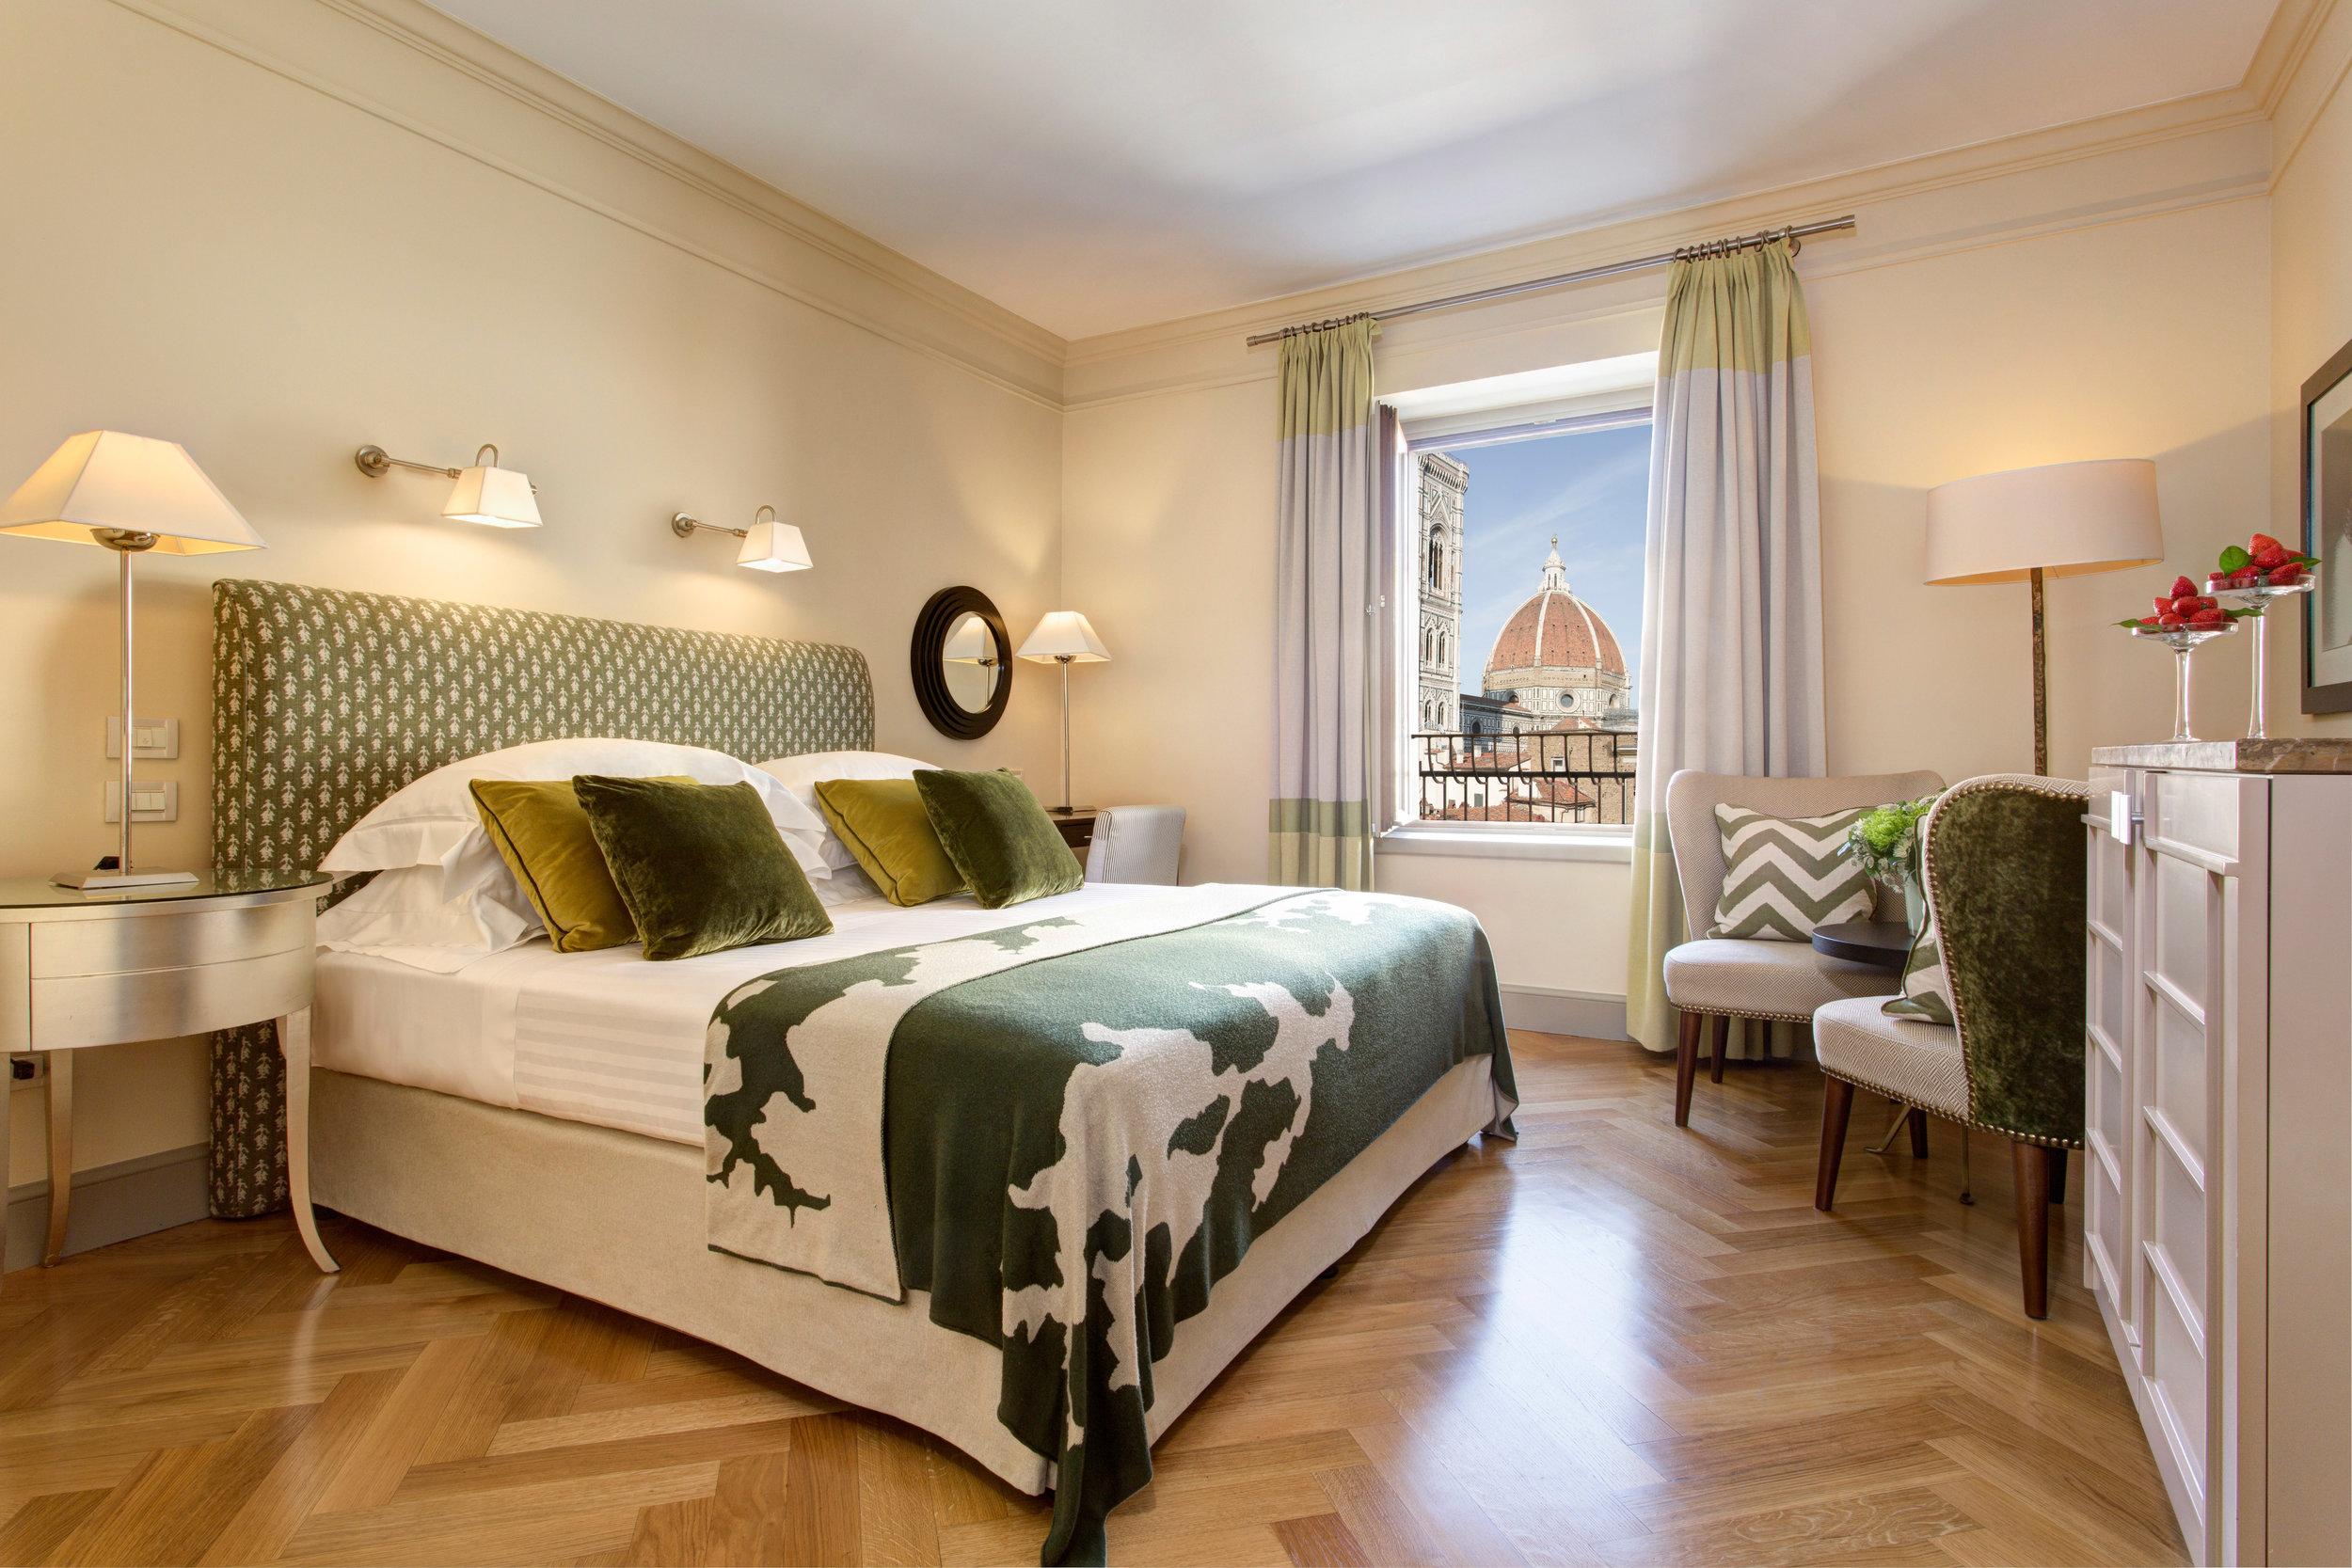 6 RFH Hotel Savoy - Duomo View Room 3888 JG Oct 16.JPG